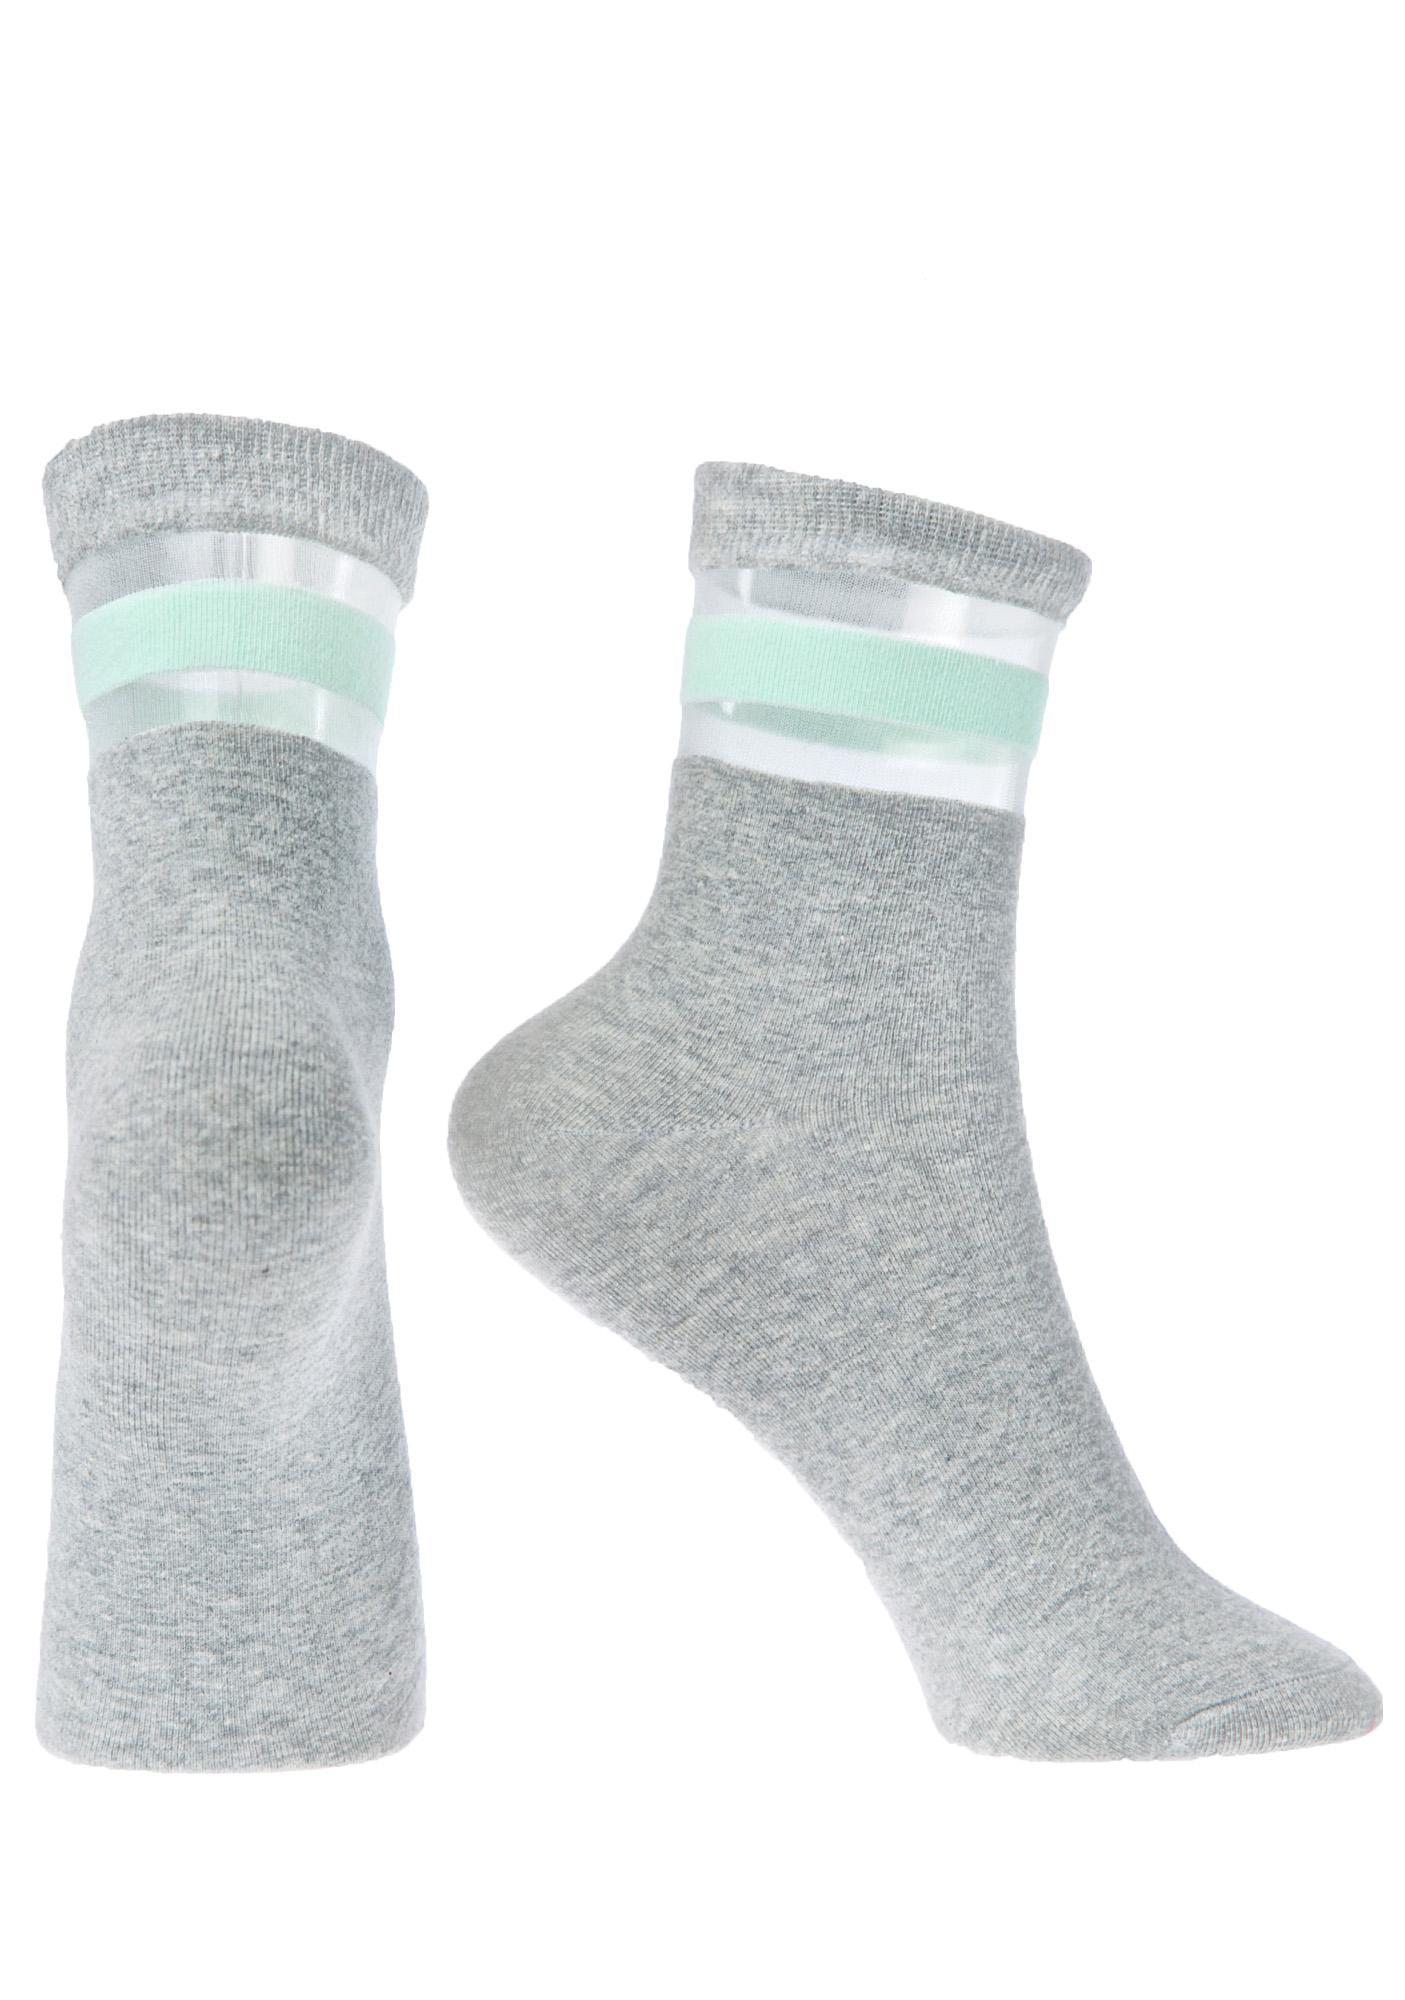 Get Physical Mint Socks